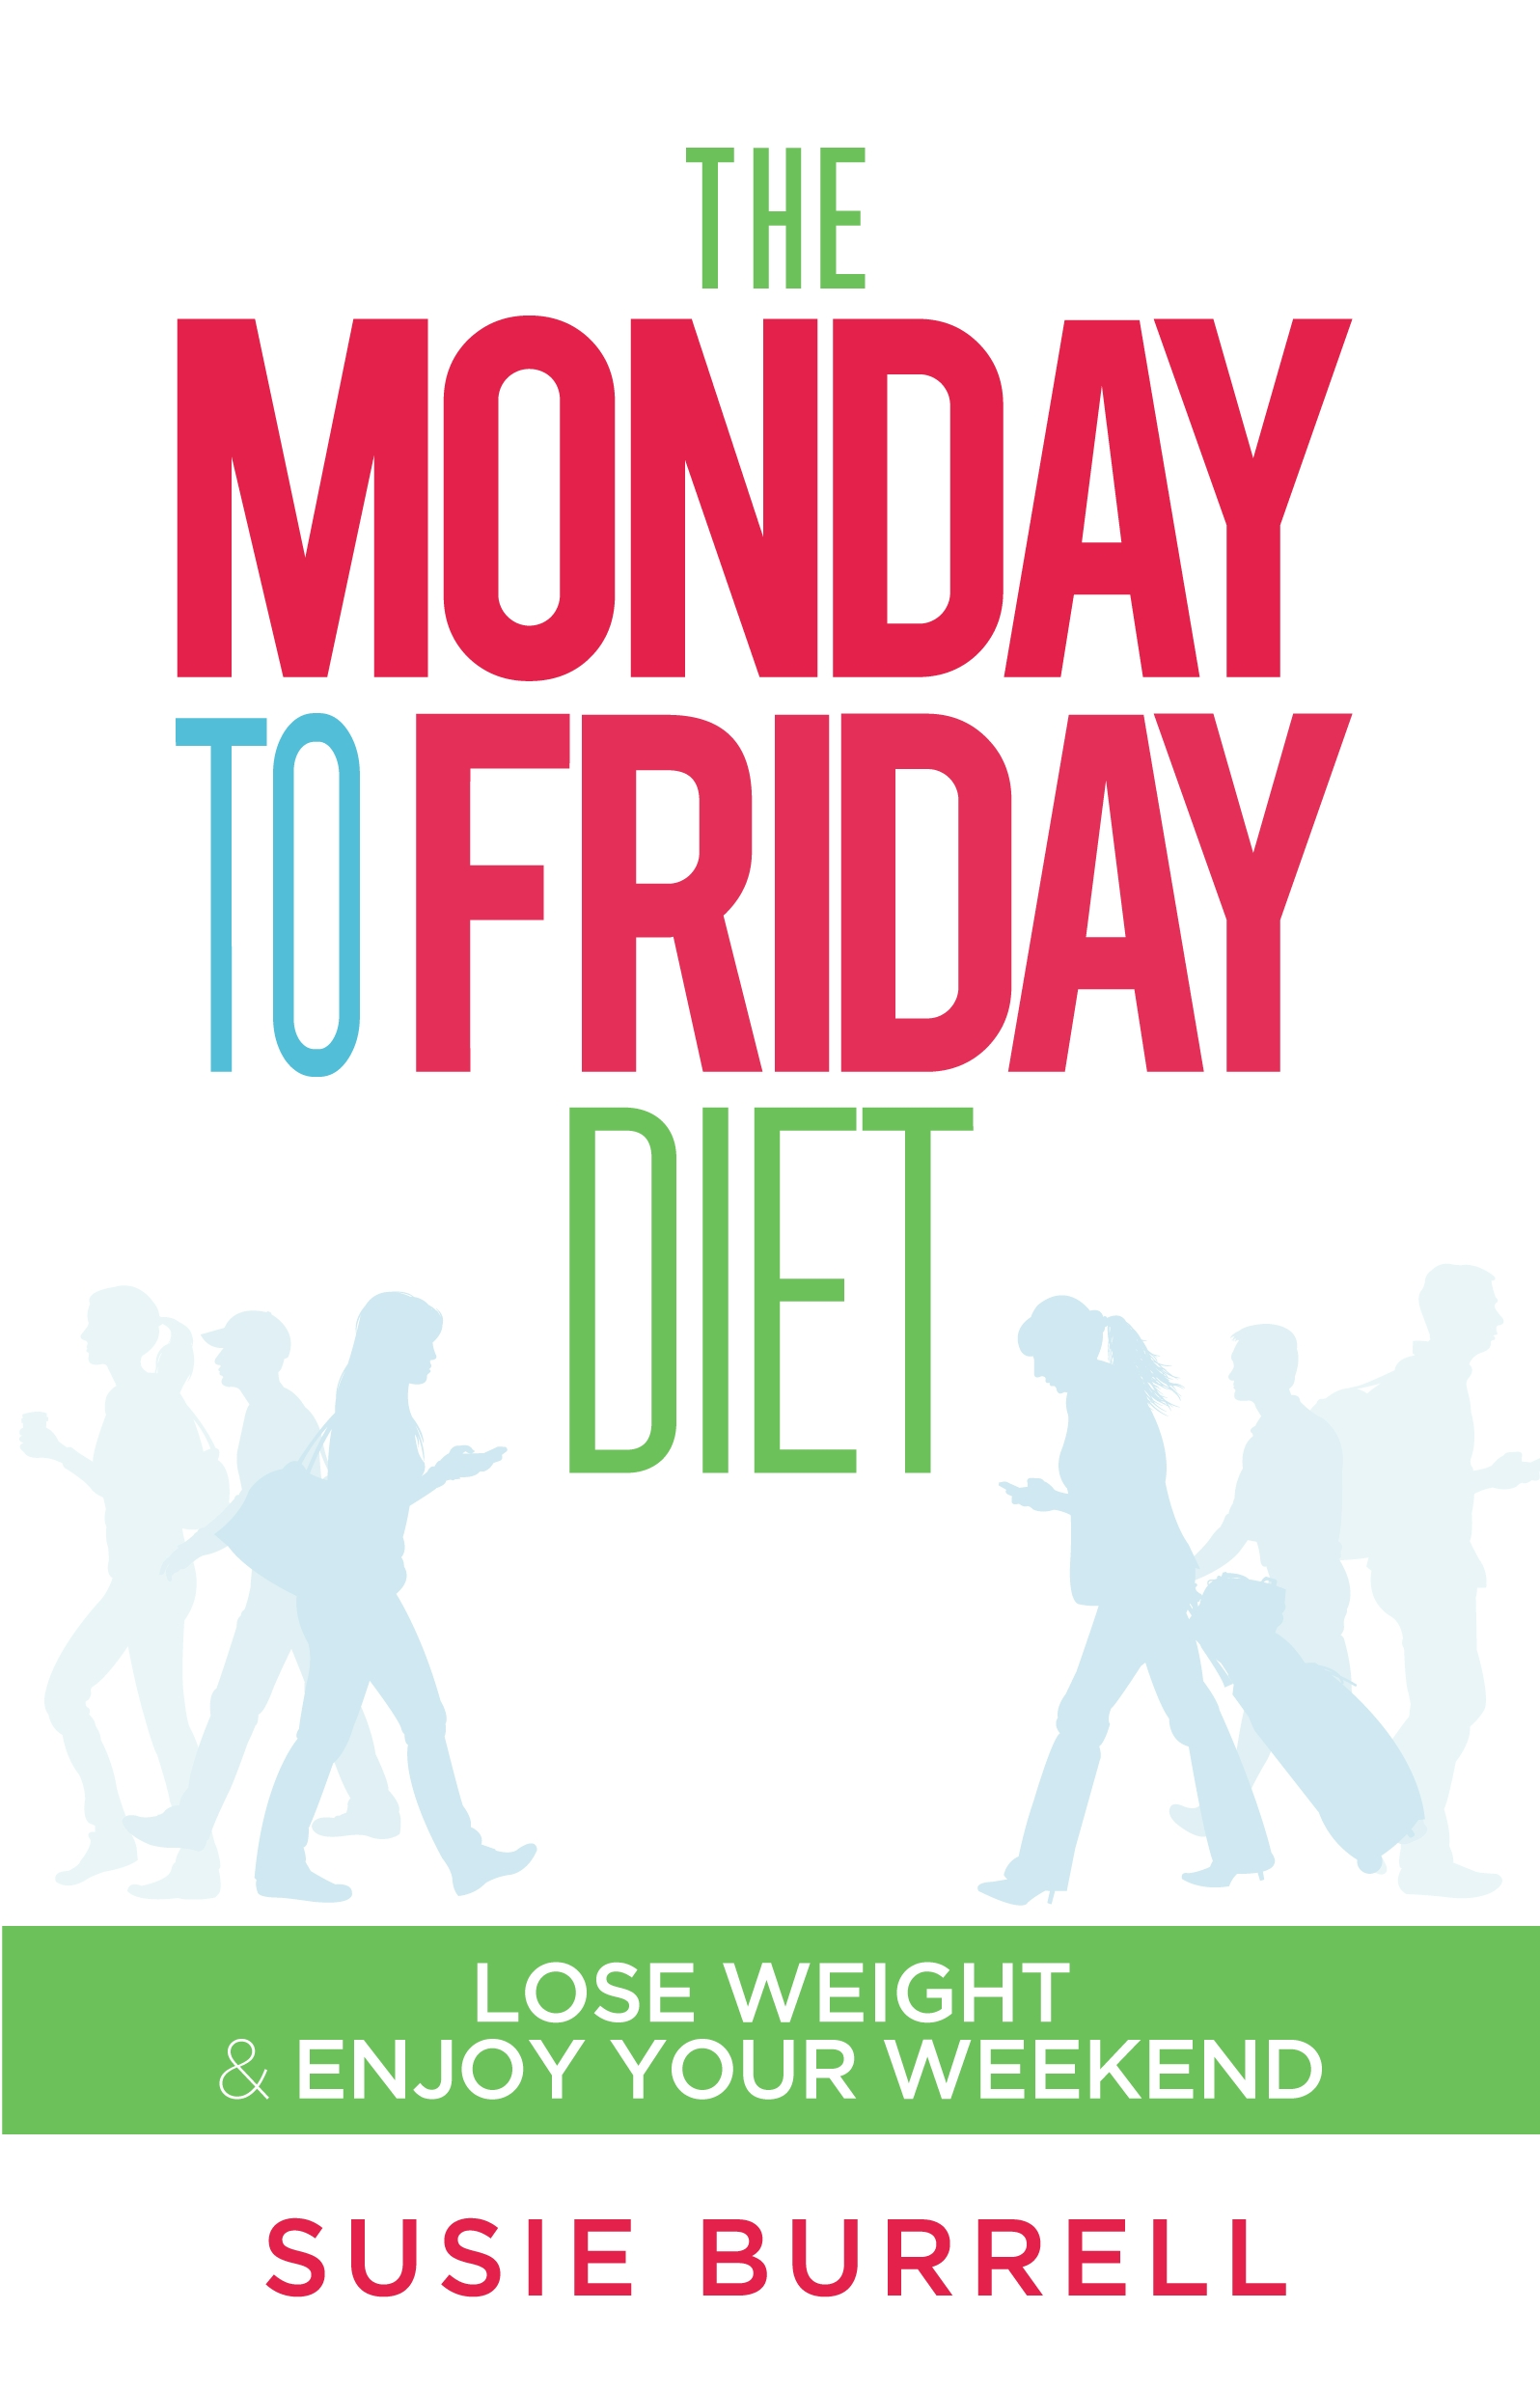 20 Day Shred Diet Plan